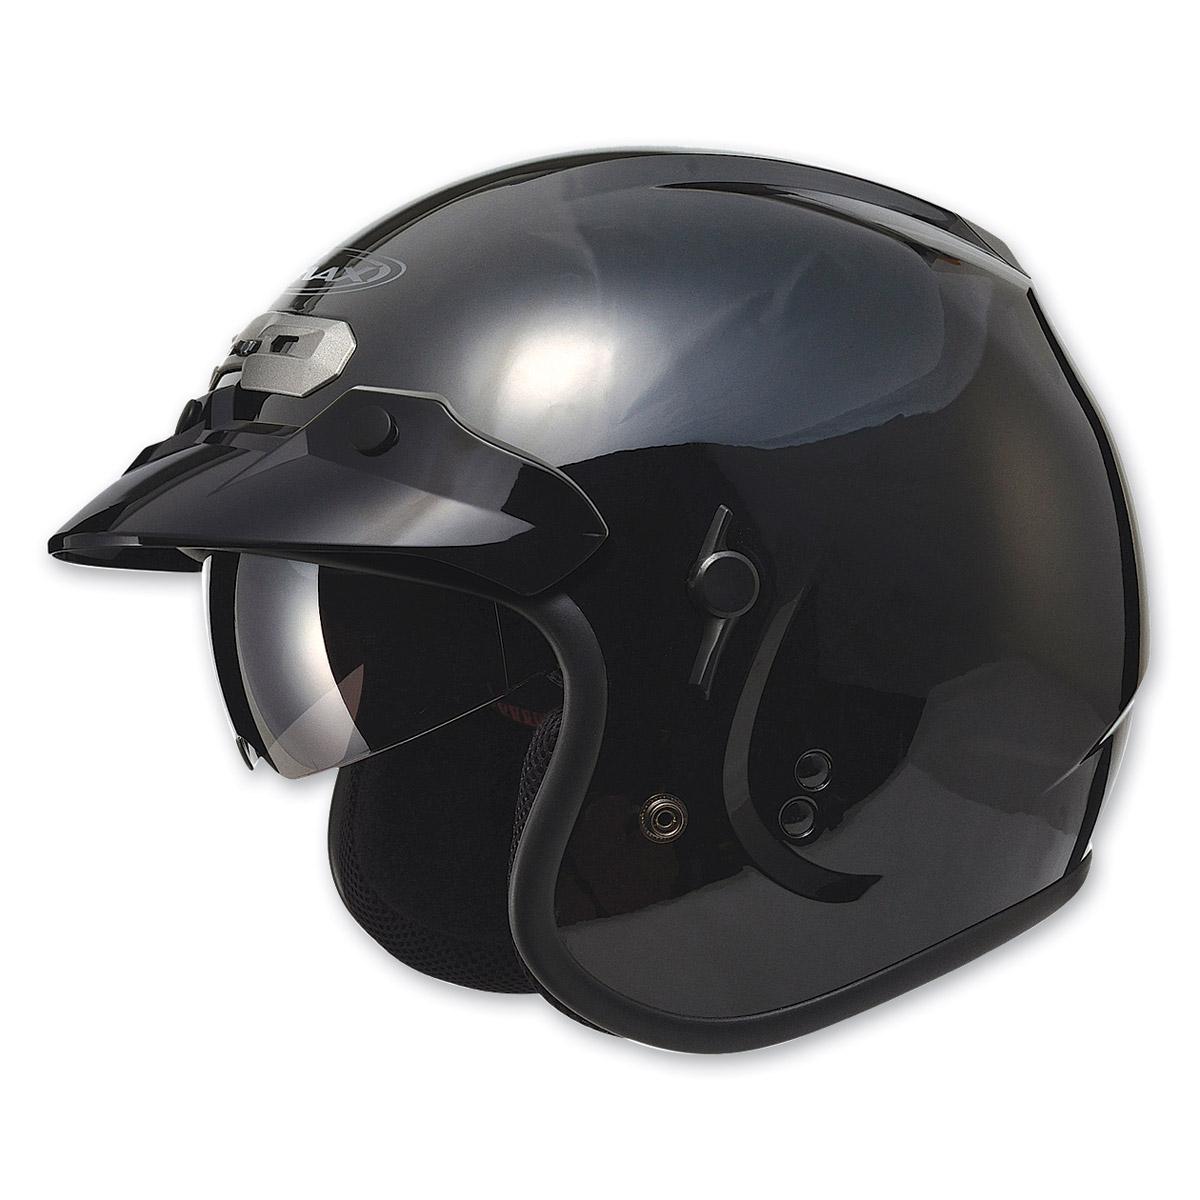 GMAX GM32 Open Face Black Helmet